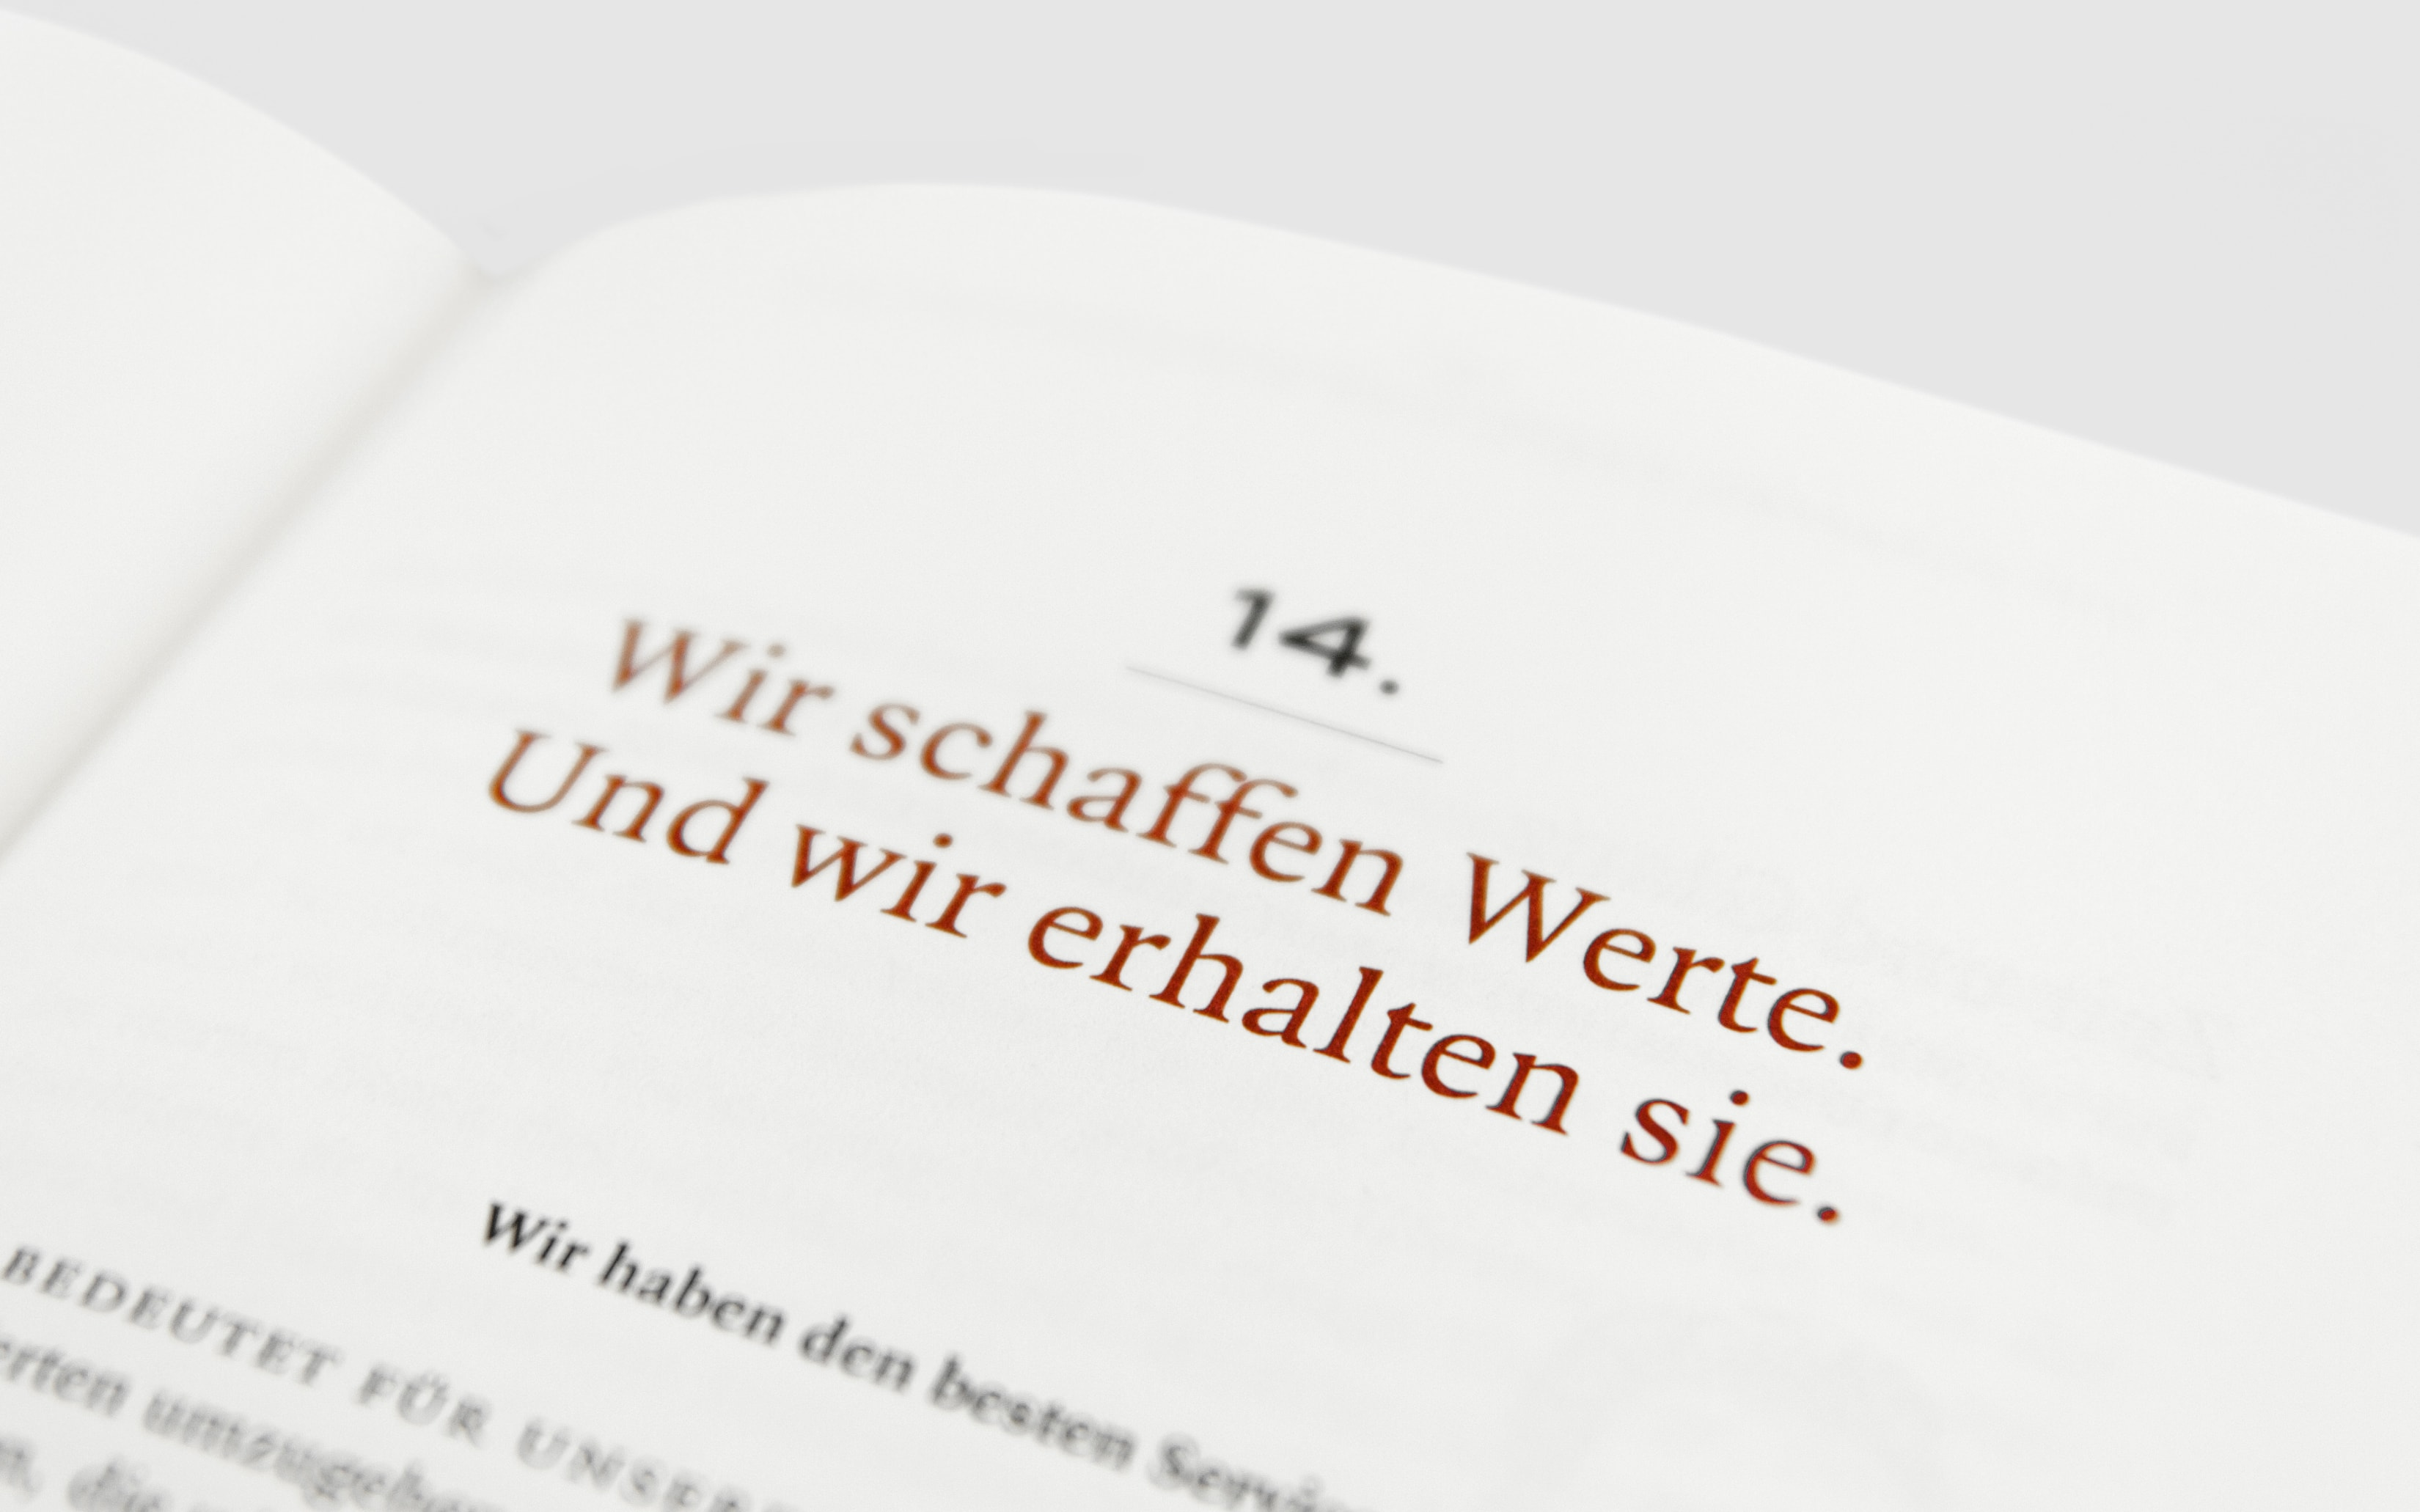 Bureau Johannes Erler – Wempe